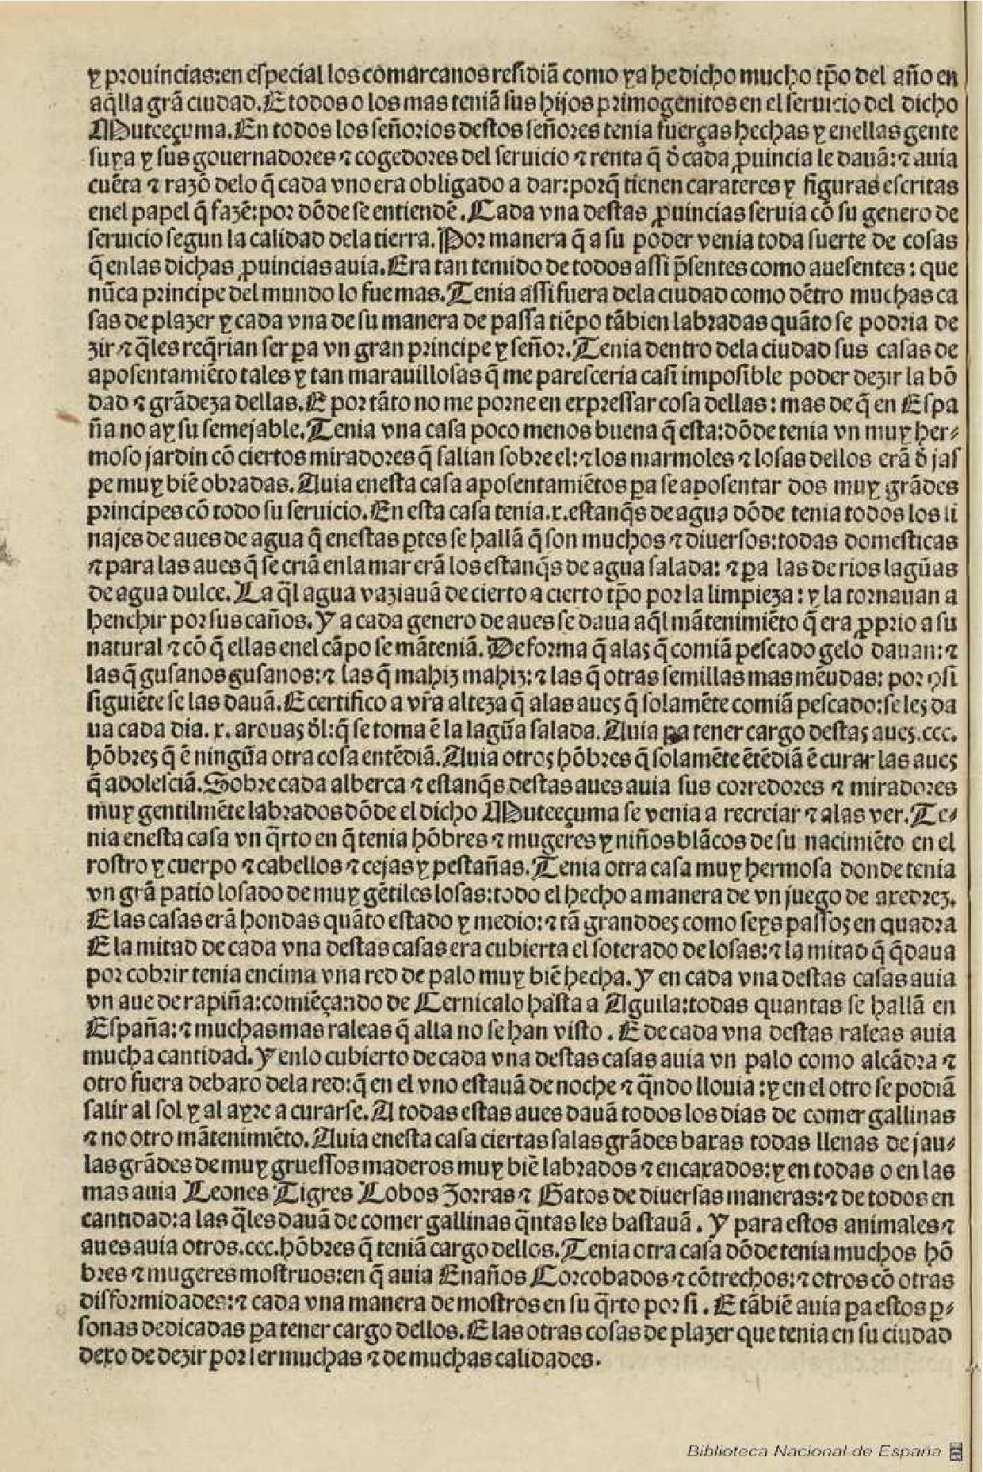 Carta de relacion Cortes 1520 publicada Sevilla 1522 - 16v